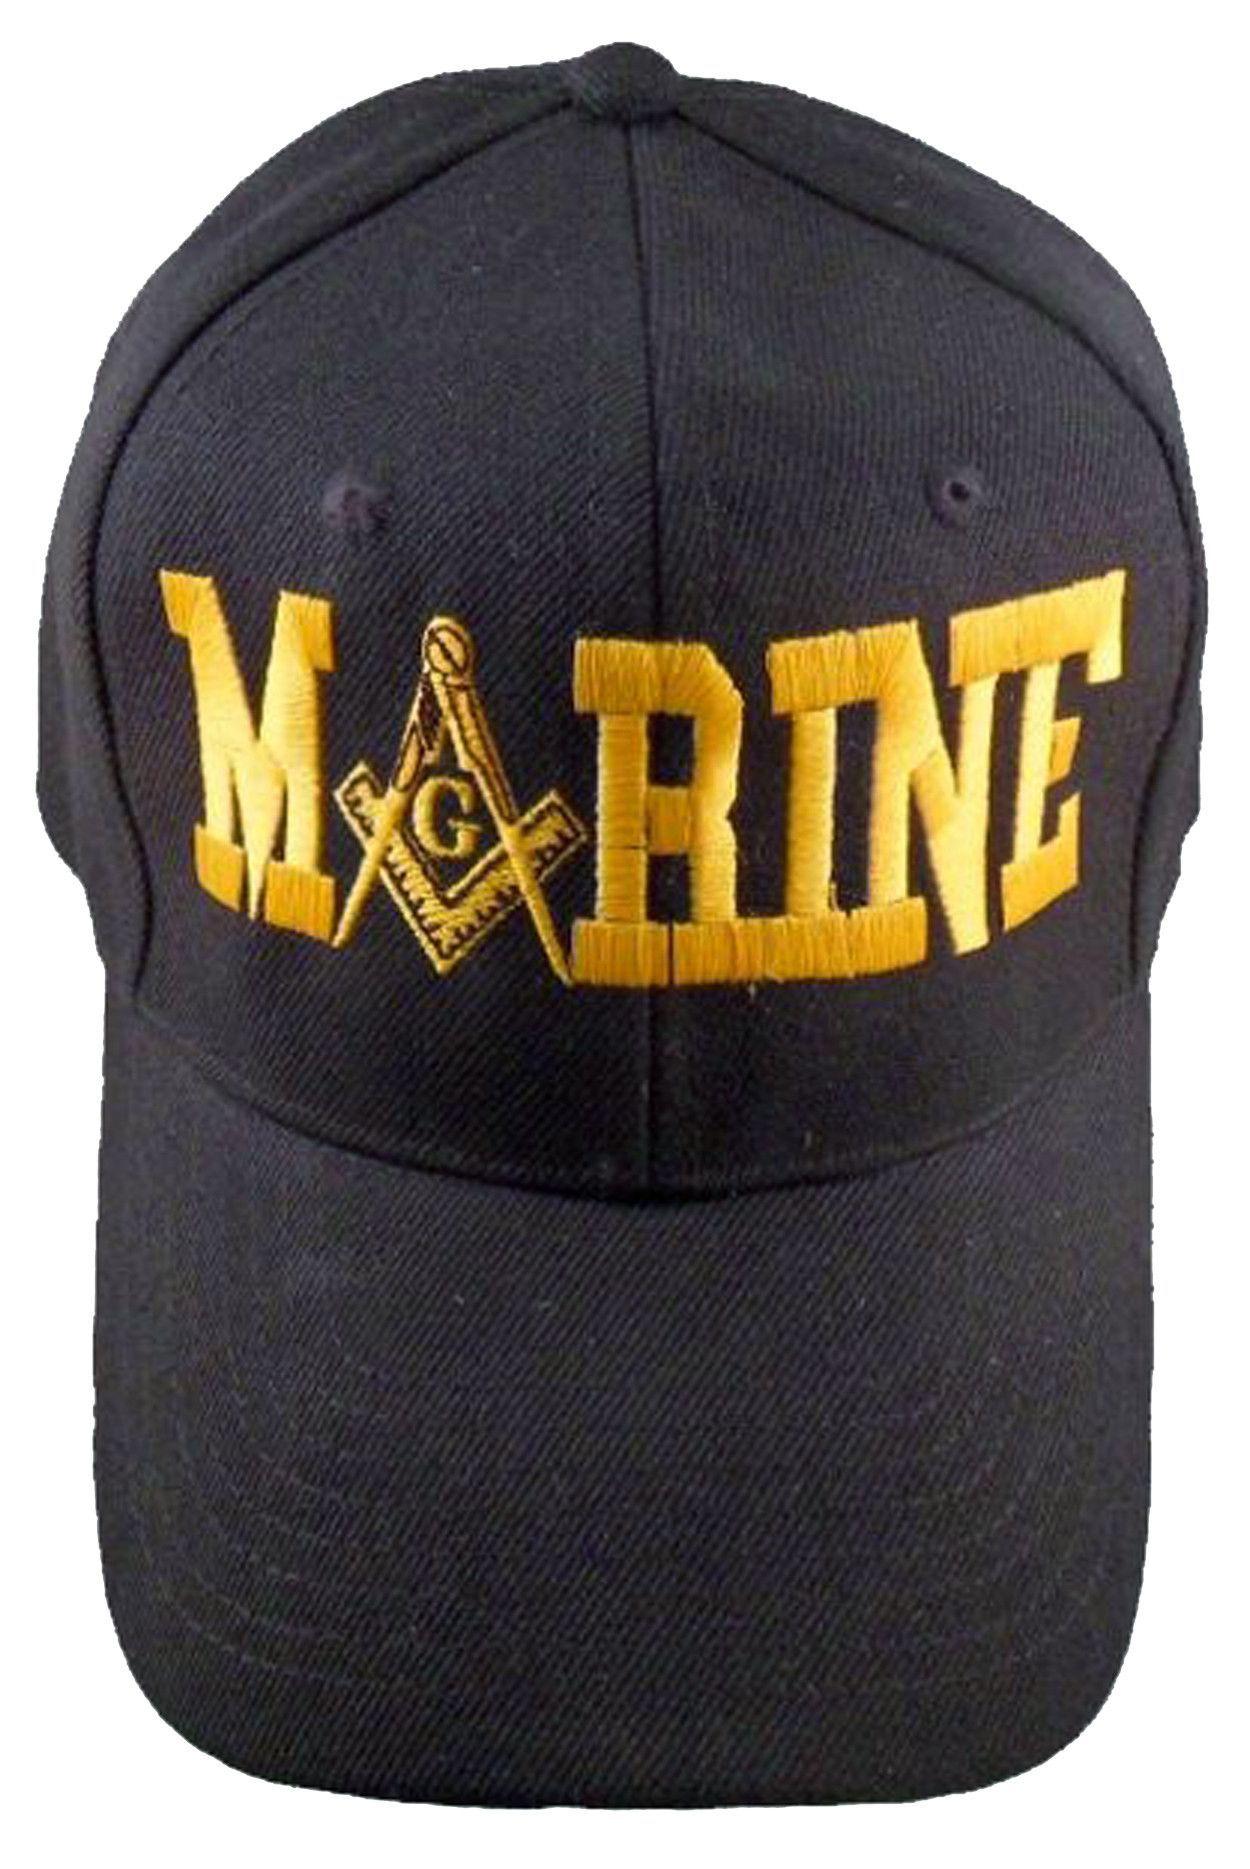 e45f02cba18 U.S. MARINES Black Masonic Baseball Cap Marine Mason Logo Hat for  Freemasons Shriners Prince Hall Masons Headwear